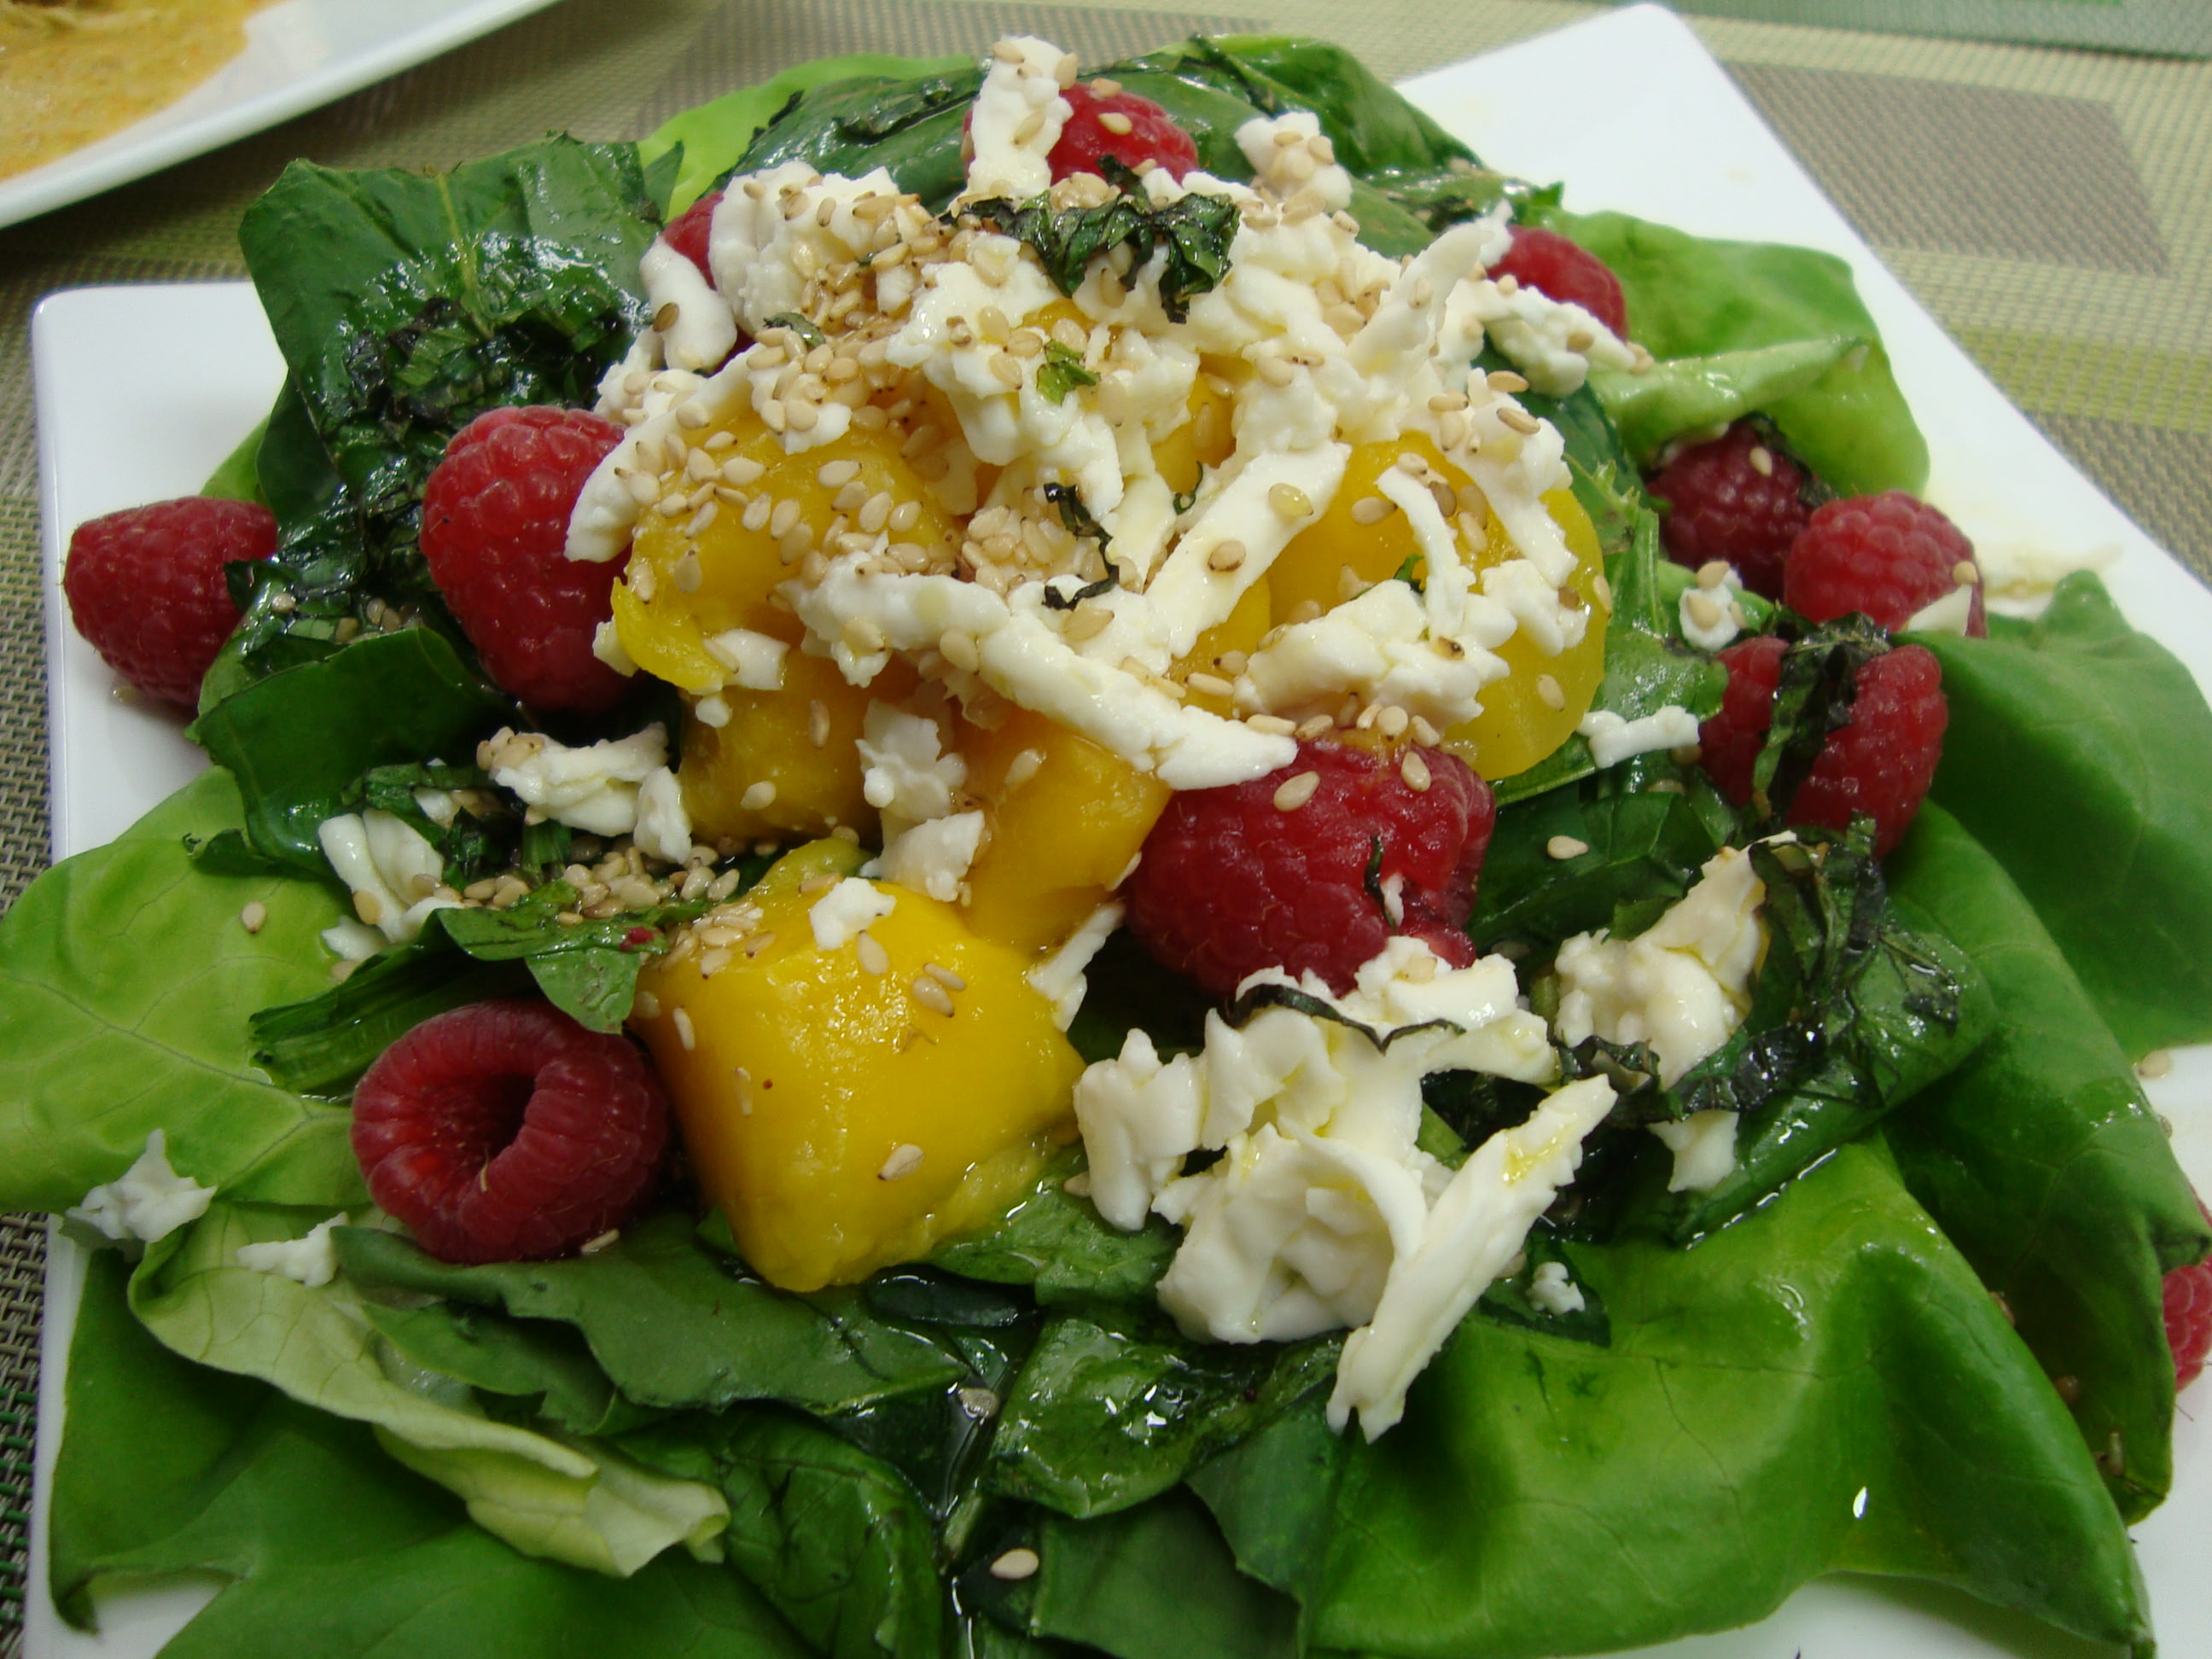 Receta para pteparar ensalada fresca